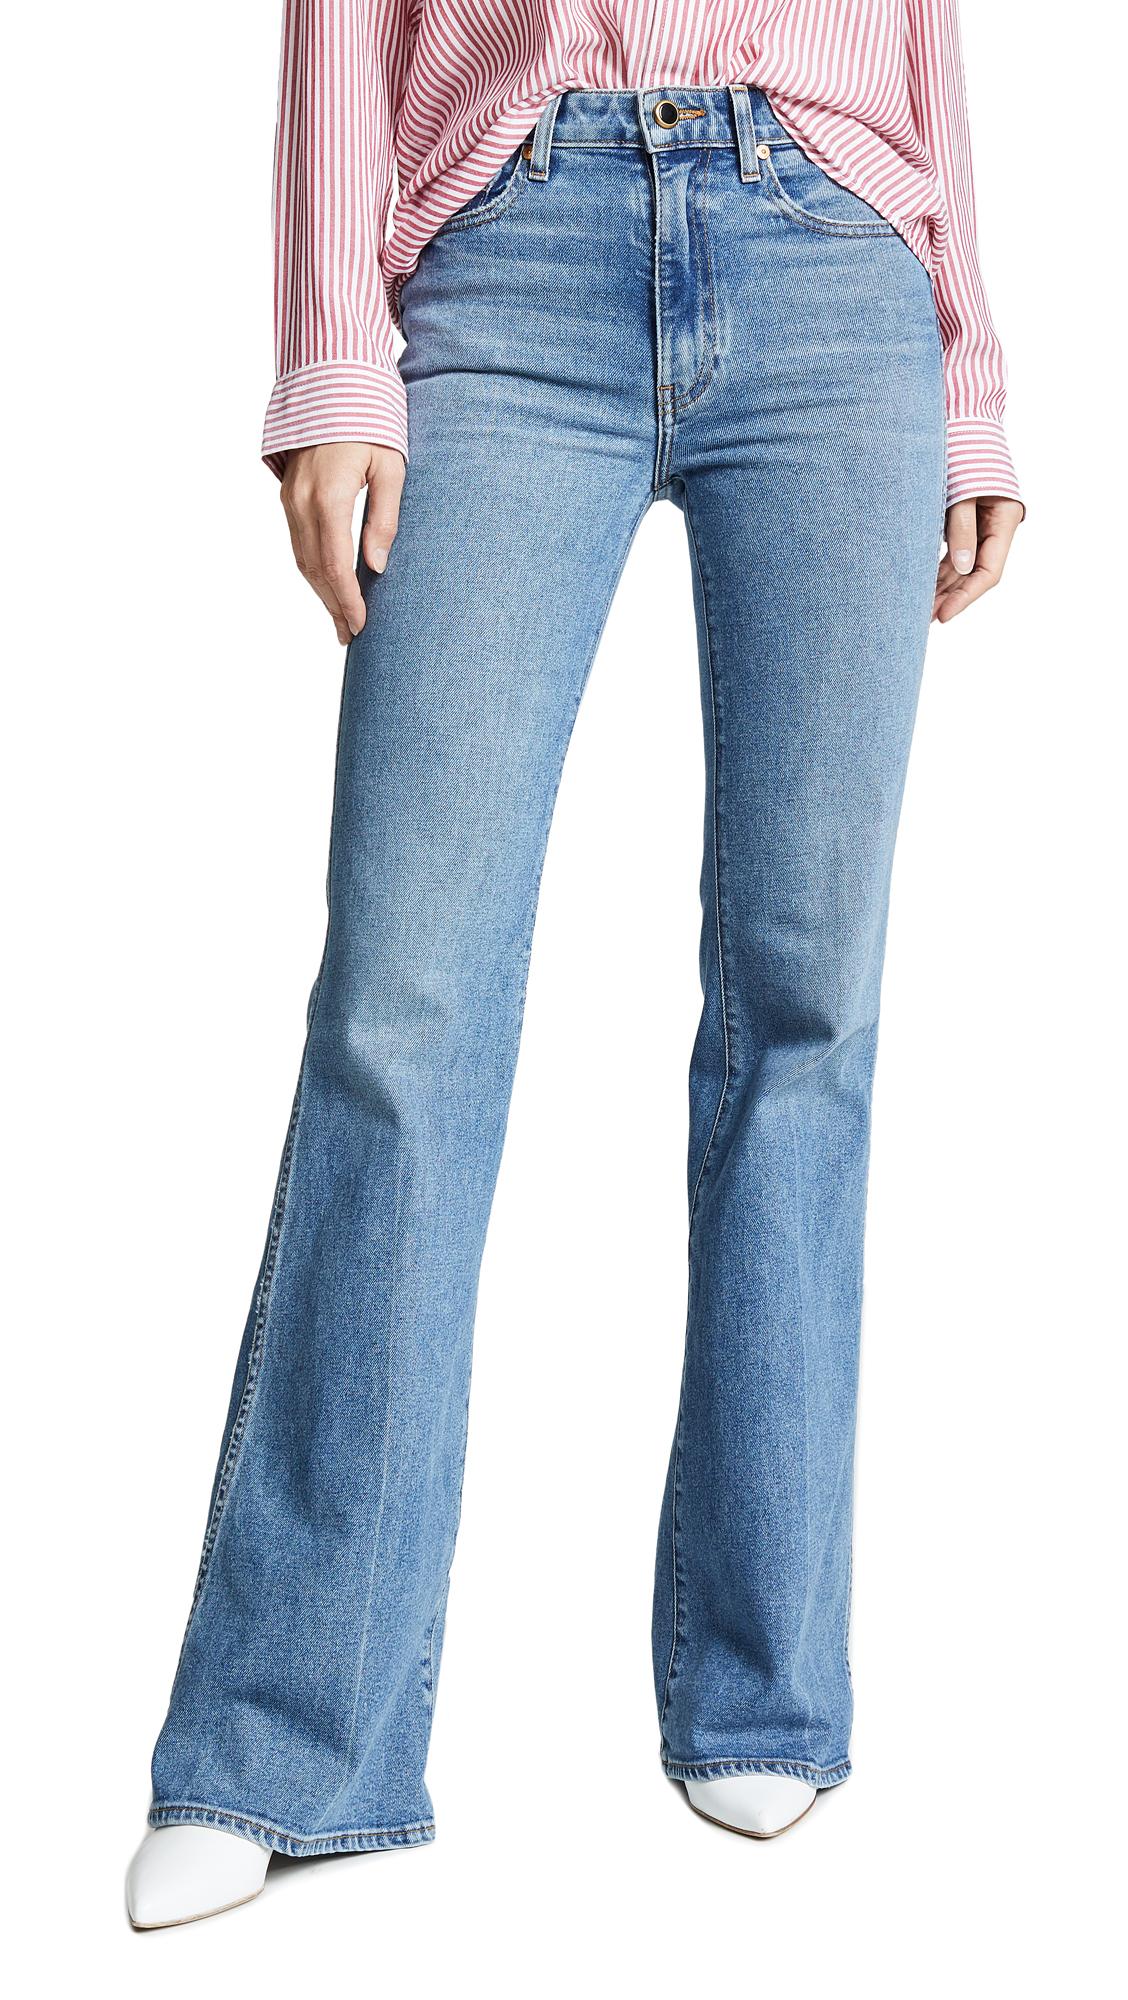 Khaite Reece Flare Jeans In Vintage Blue